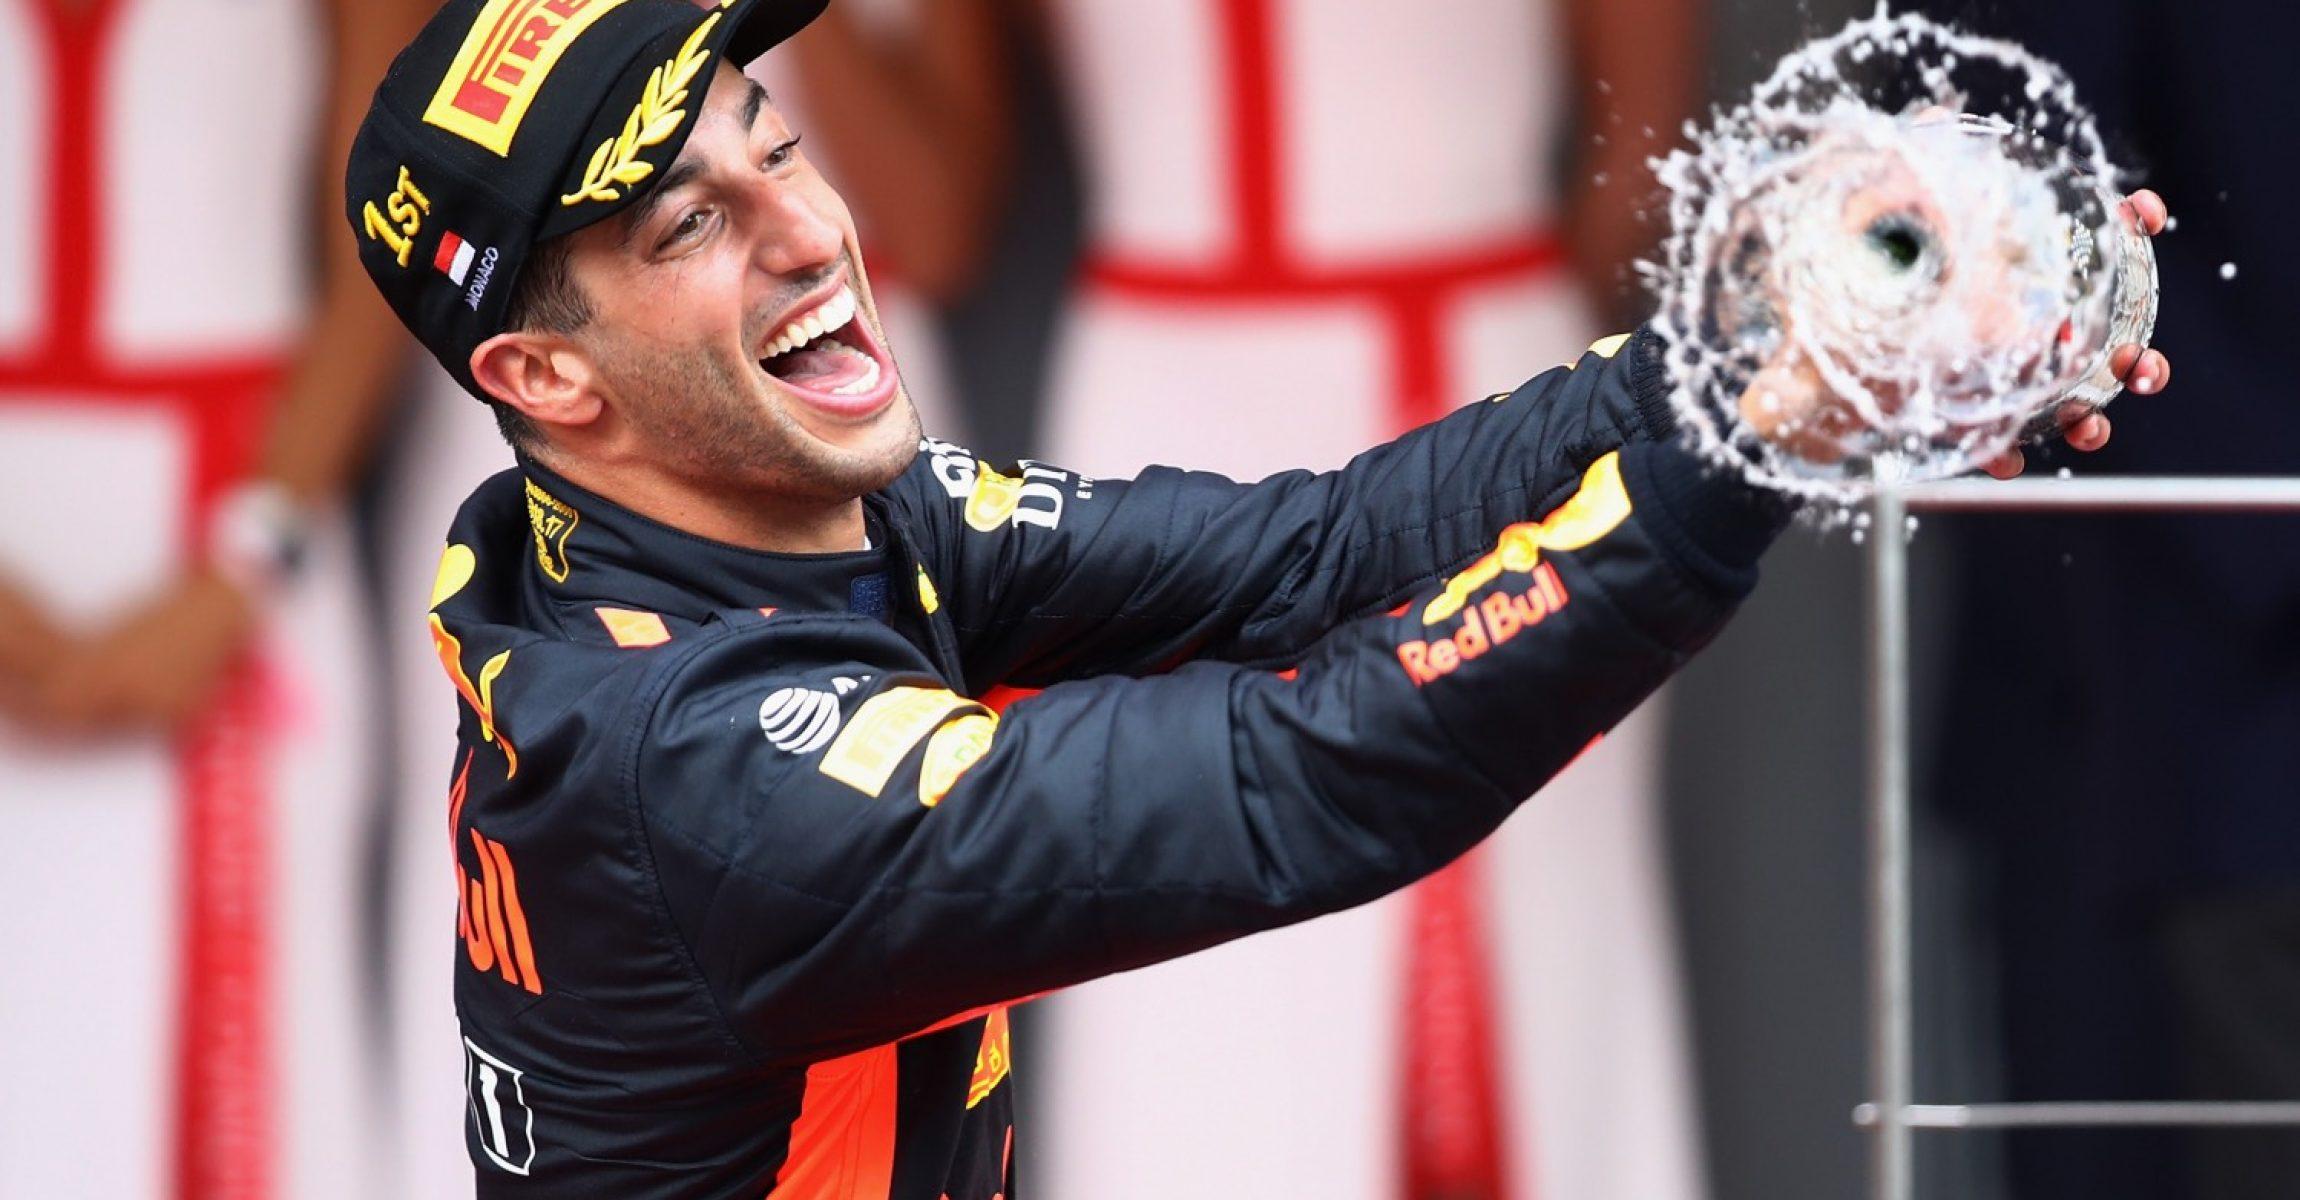 MONTE-CARLO, MONACO - MAY 27: Race winner Daniel Ricciardo of Australia and Red Bull Racing celebrates on the podium during the Monaco Formula One Grand Prix at Circuit de Monaco on May 27, 2018 in Monte-Carlo, Monaco. (Photo by Mark Thompson/Getty Images)